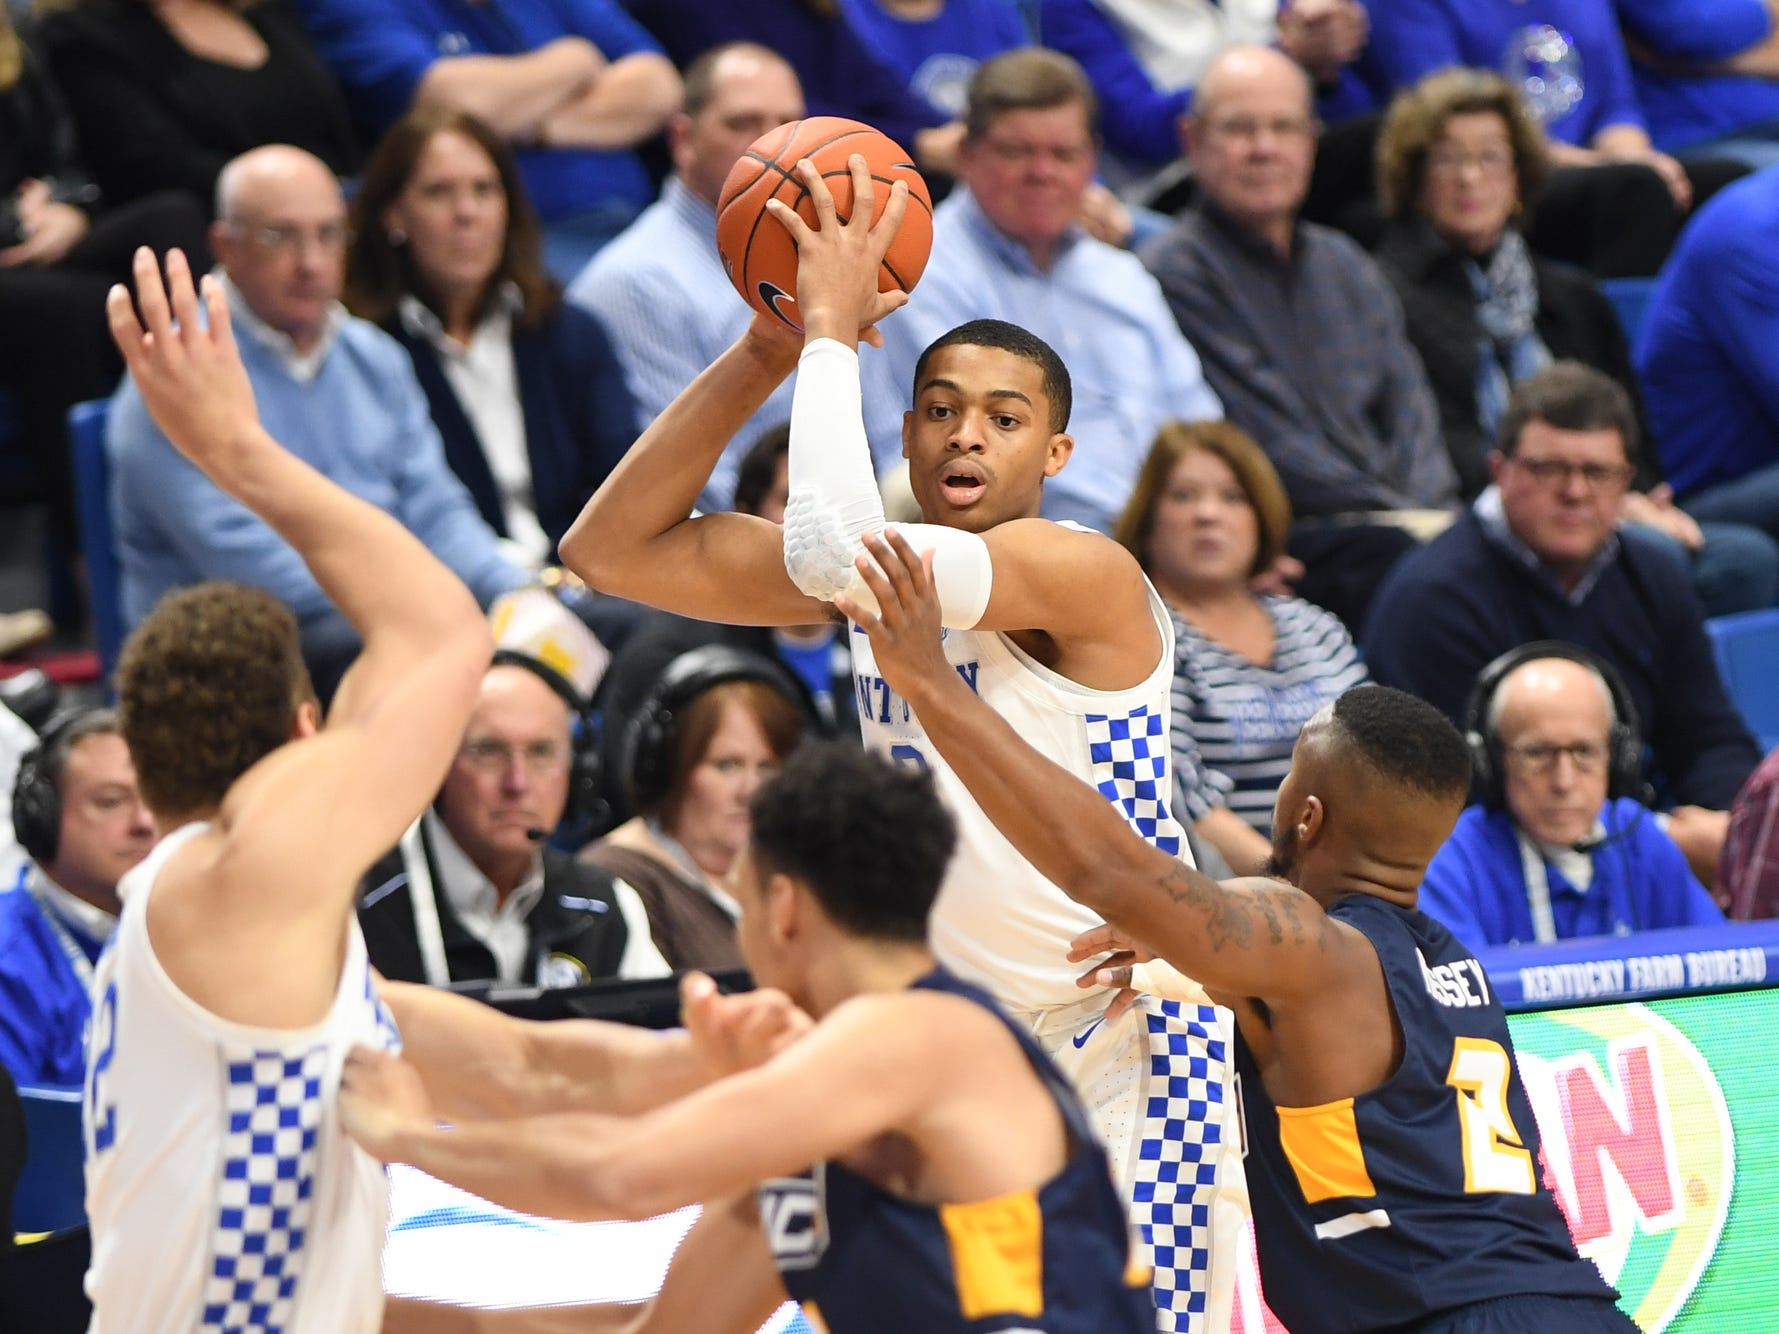 UK G Keldon Johnson controls the ball during the University of Kentucky men's basketball game against UNC Greensboro at Rupp Arena in Lexington, Kentucky on Saturday, December 1, 2018.